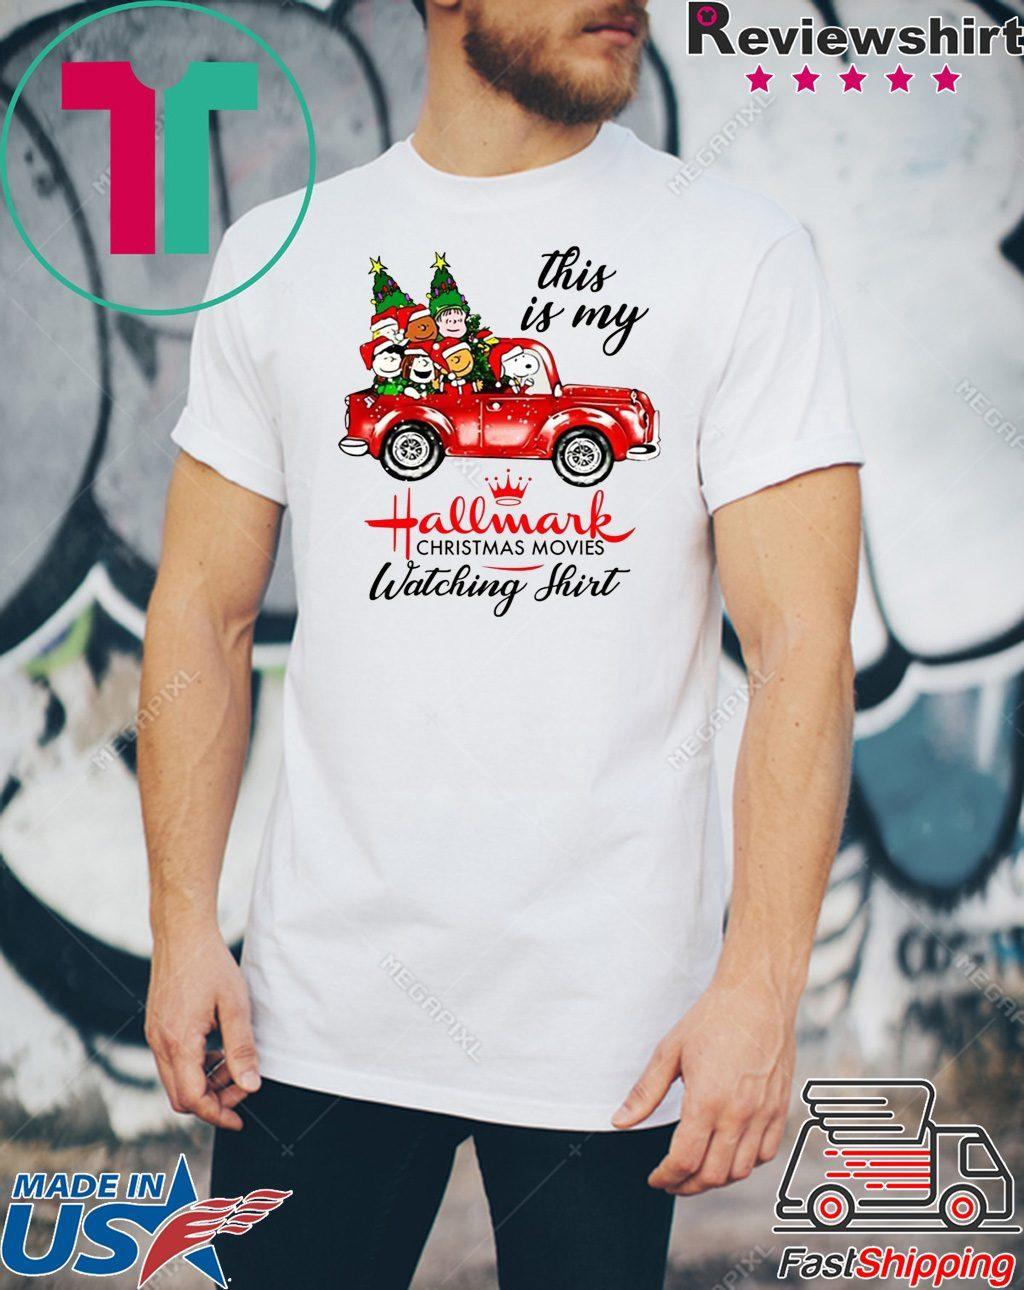 Hallmark Christmas T Shirt.Snoopy Hallmark Christmas T Shirt Reviewshirts Office